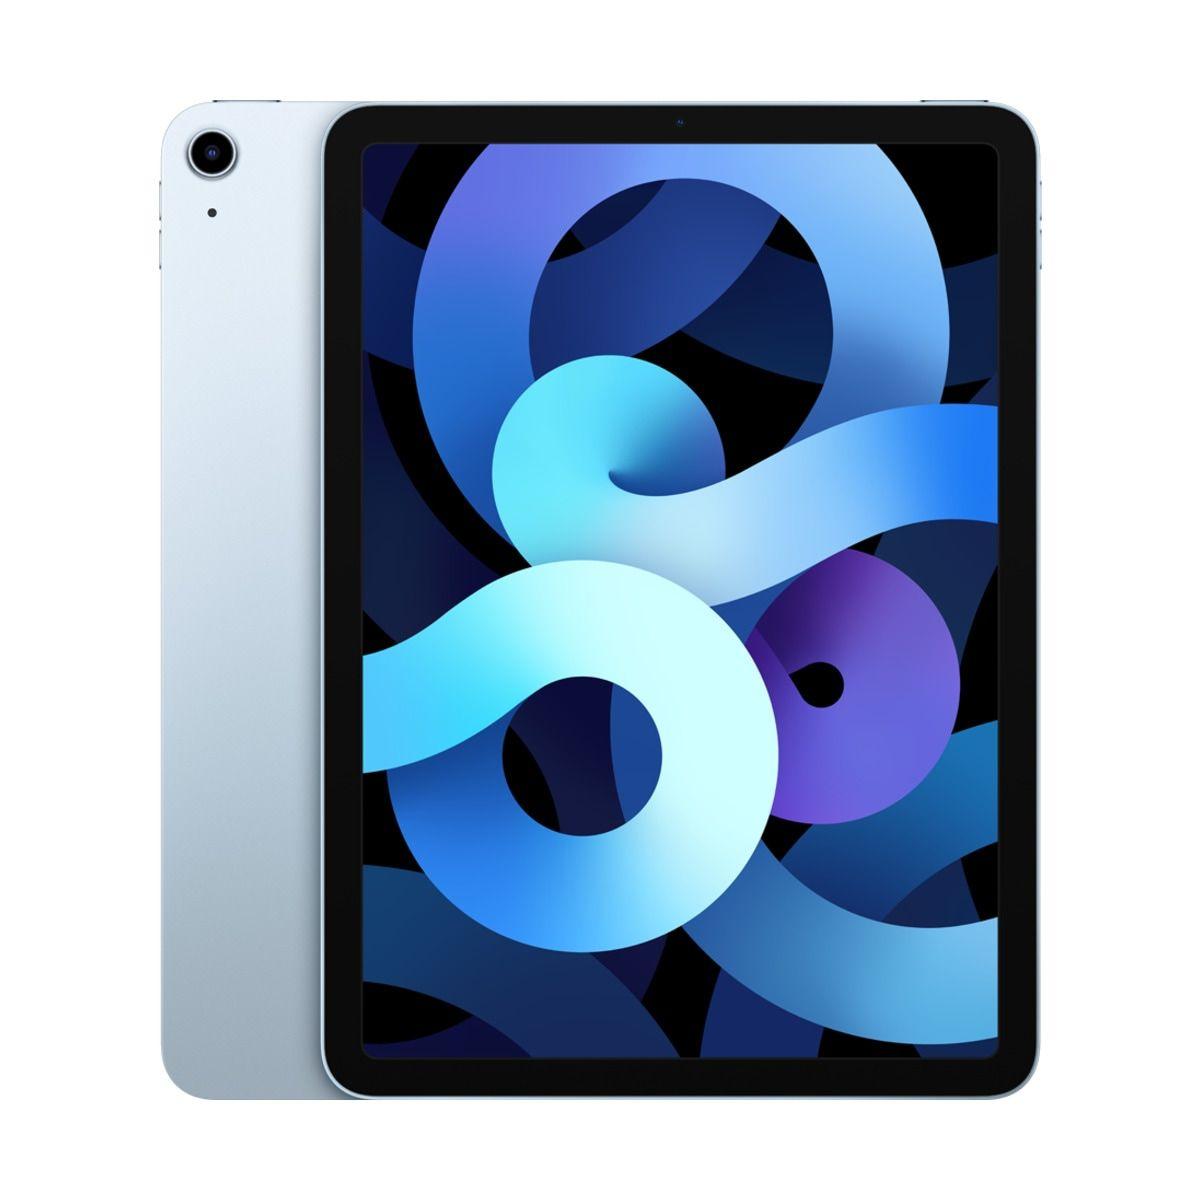 Apple iPad Air Wi-Fi + Cell 256GB - Sky Blue / SK